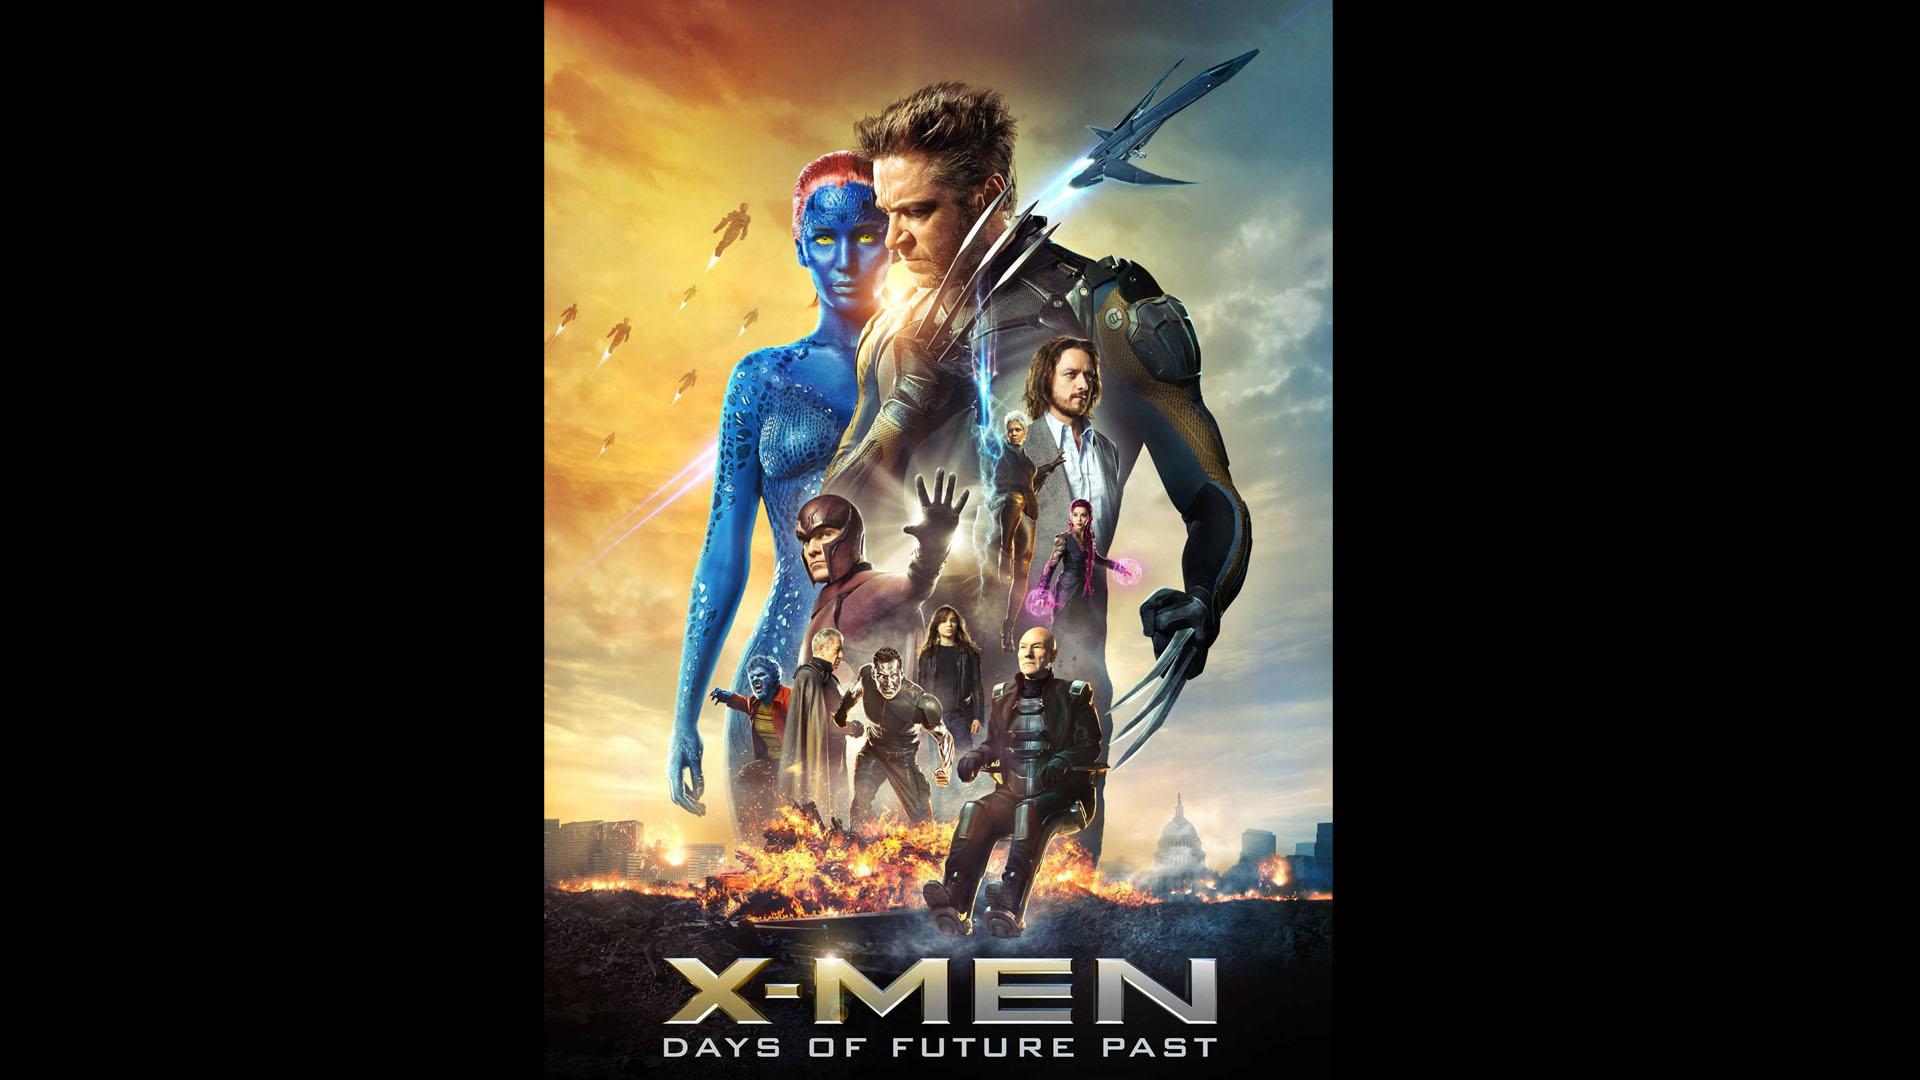 X Men Days of Future Past HQ Movie Wallpapers X Men Days 1920x1080